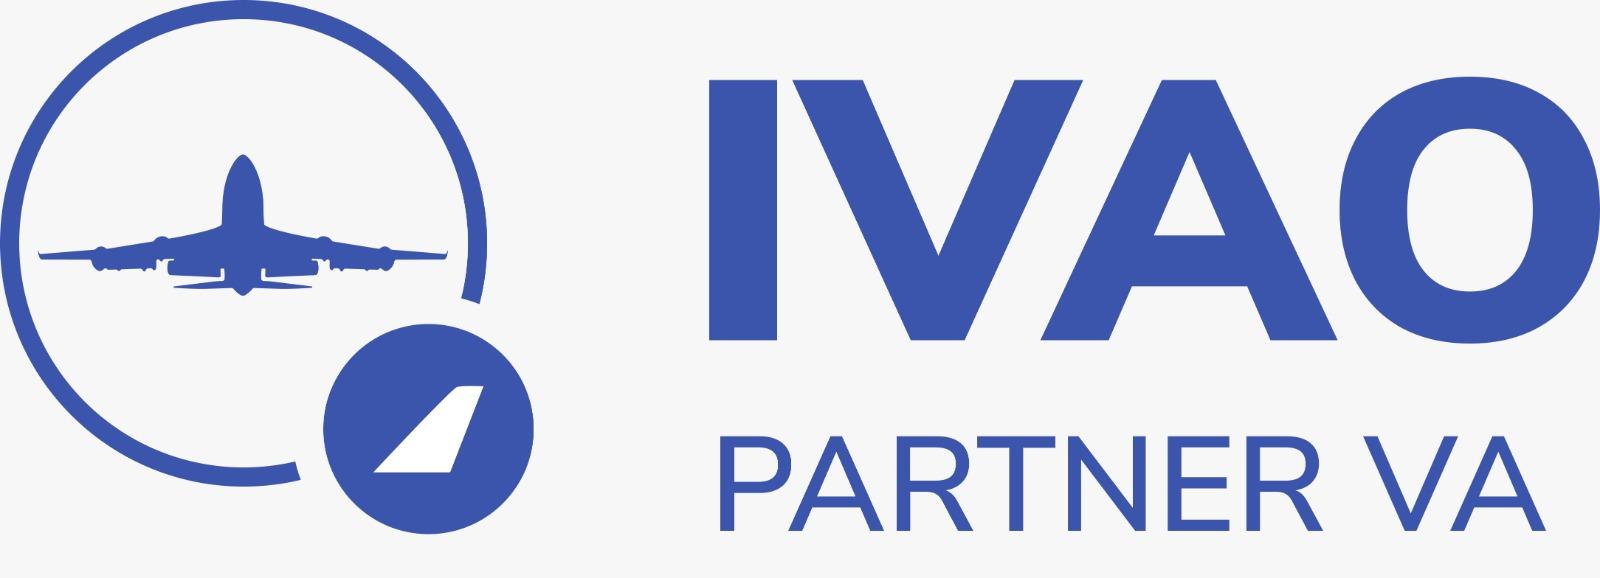 ivao member